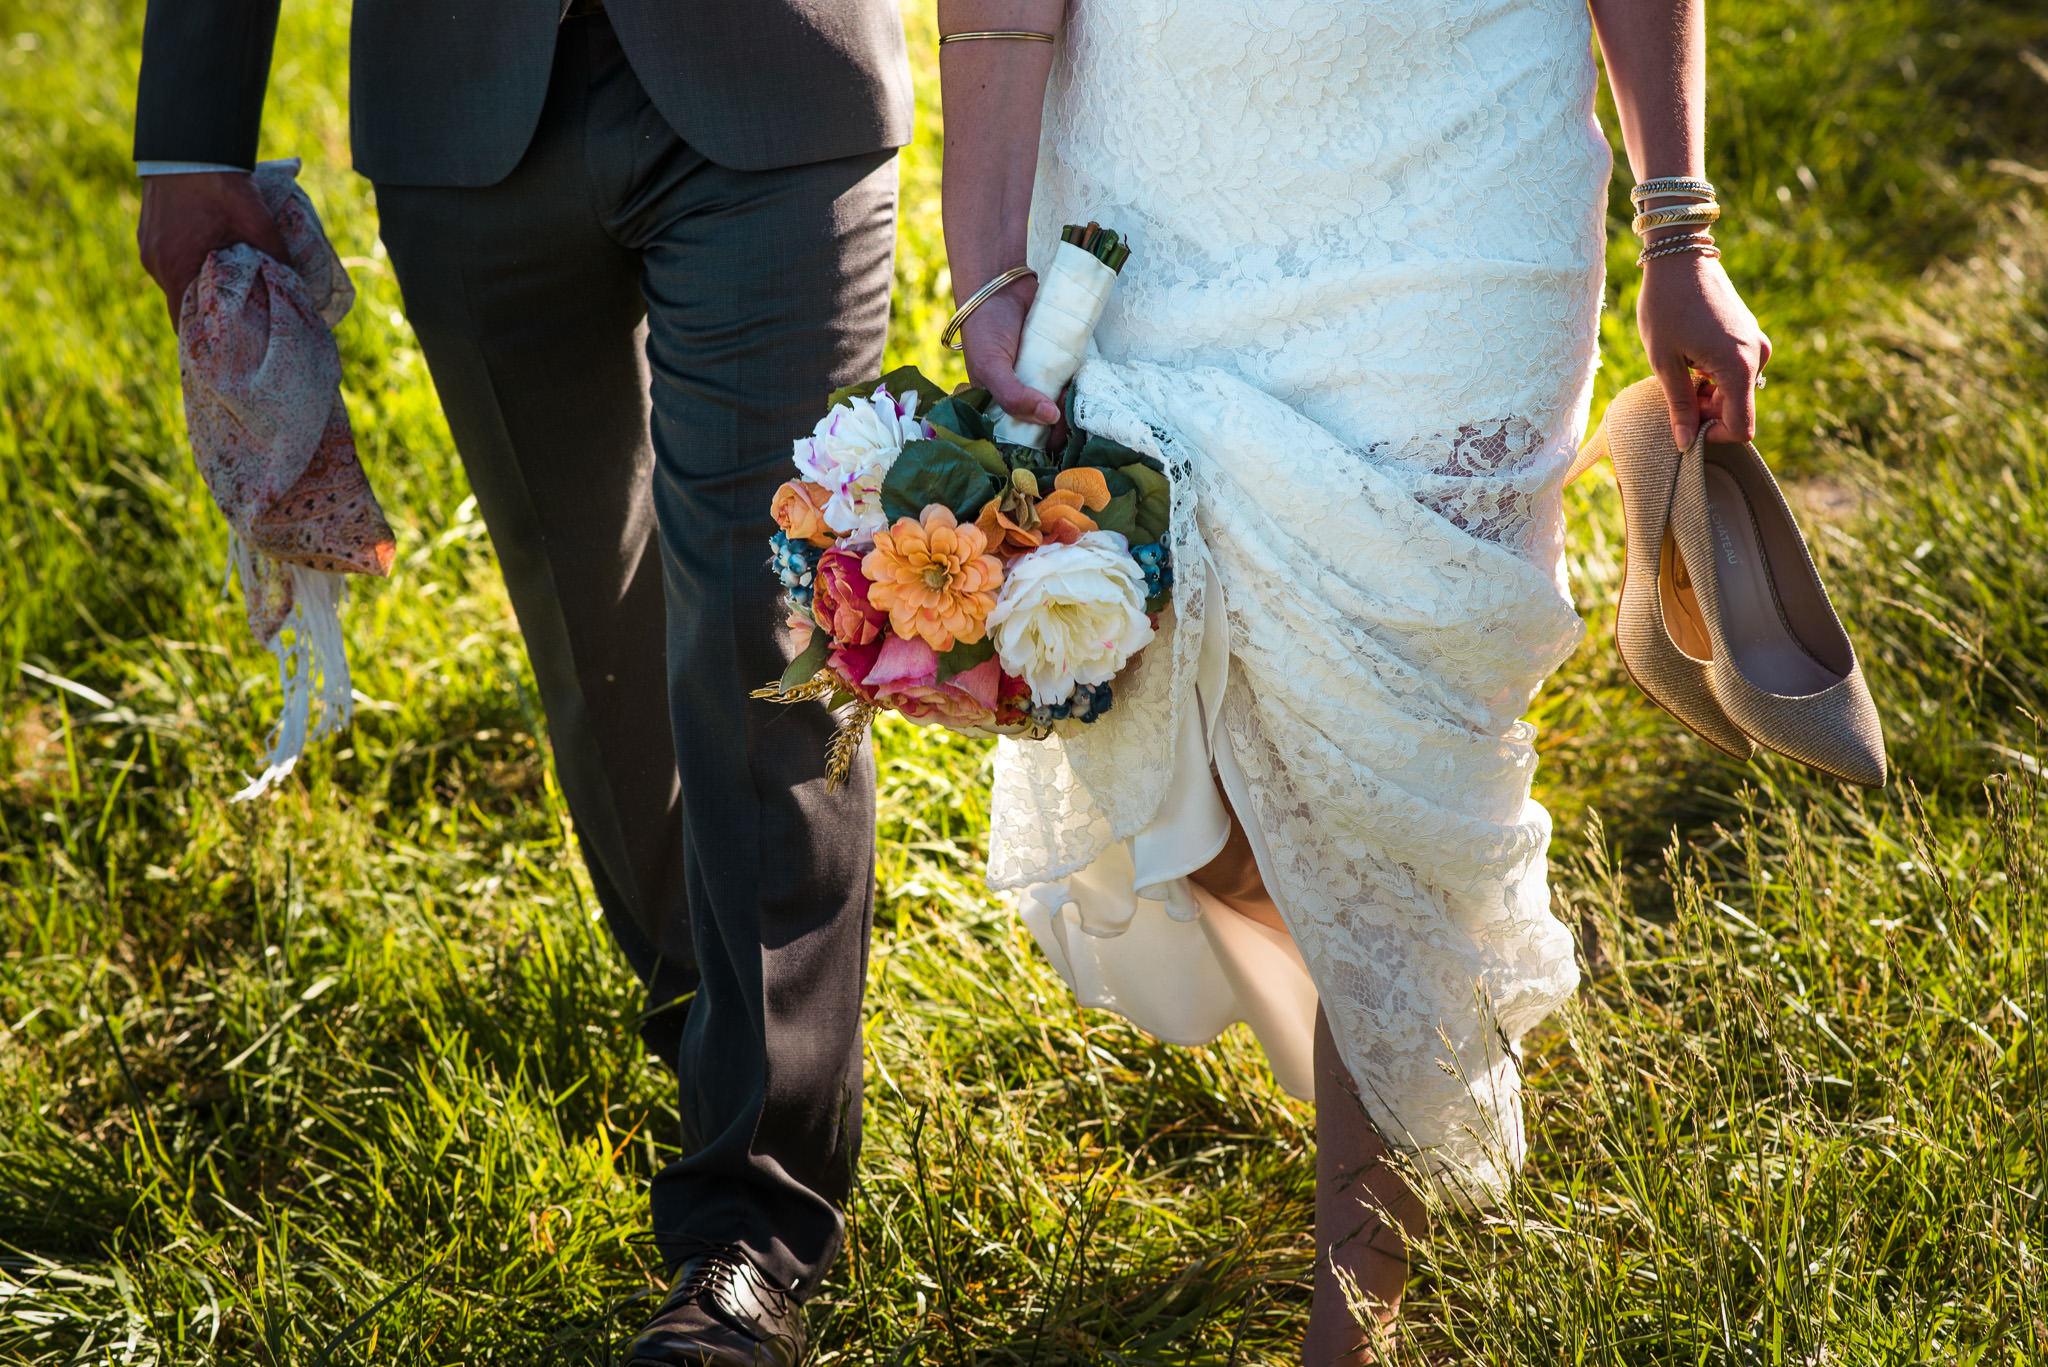 Melanie-Matt-Pitt-Lake-Post-Wedding-Shoot-Victoria-Wedding-Photographers-5.jpg